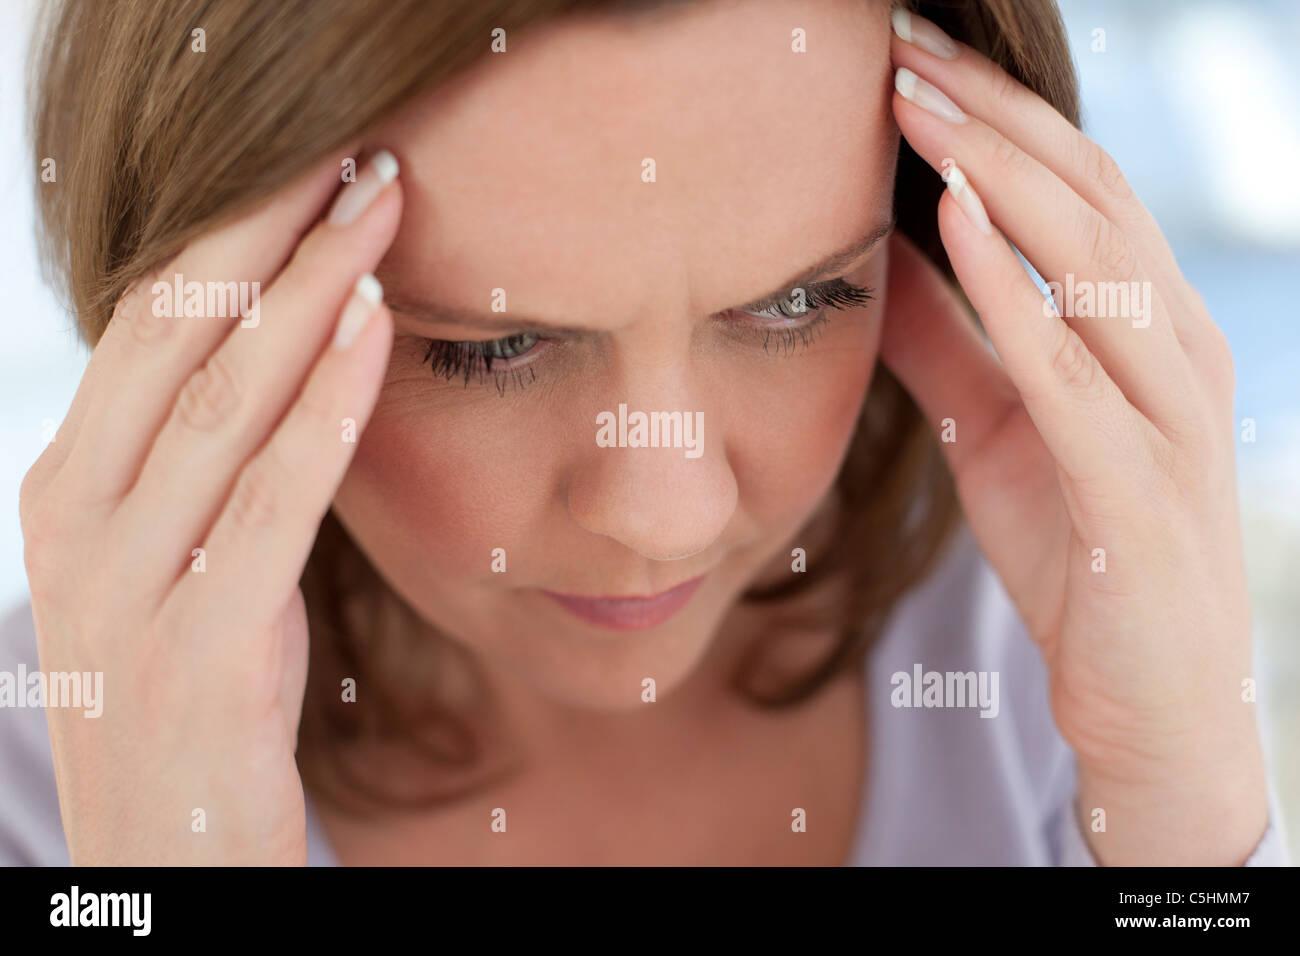 Dolor de cabeza Imagen De Stock